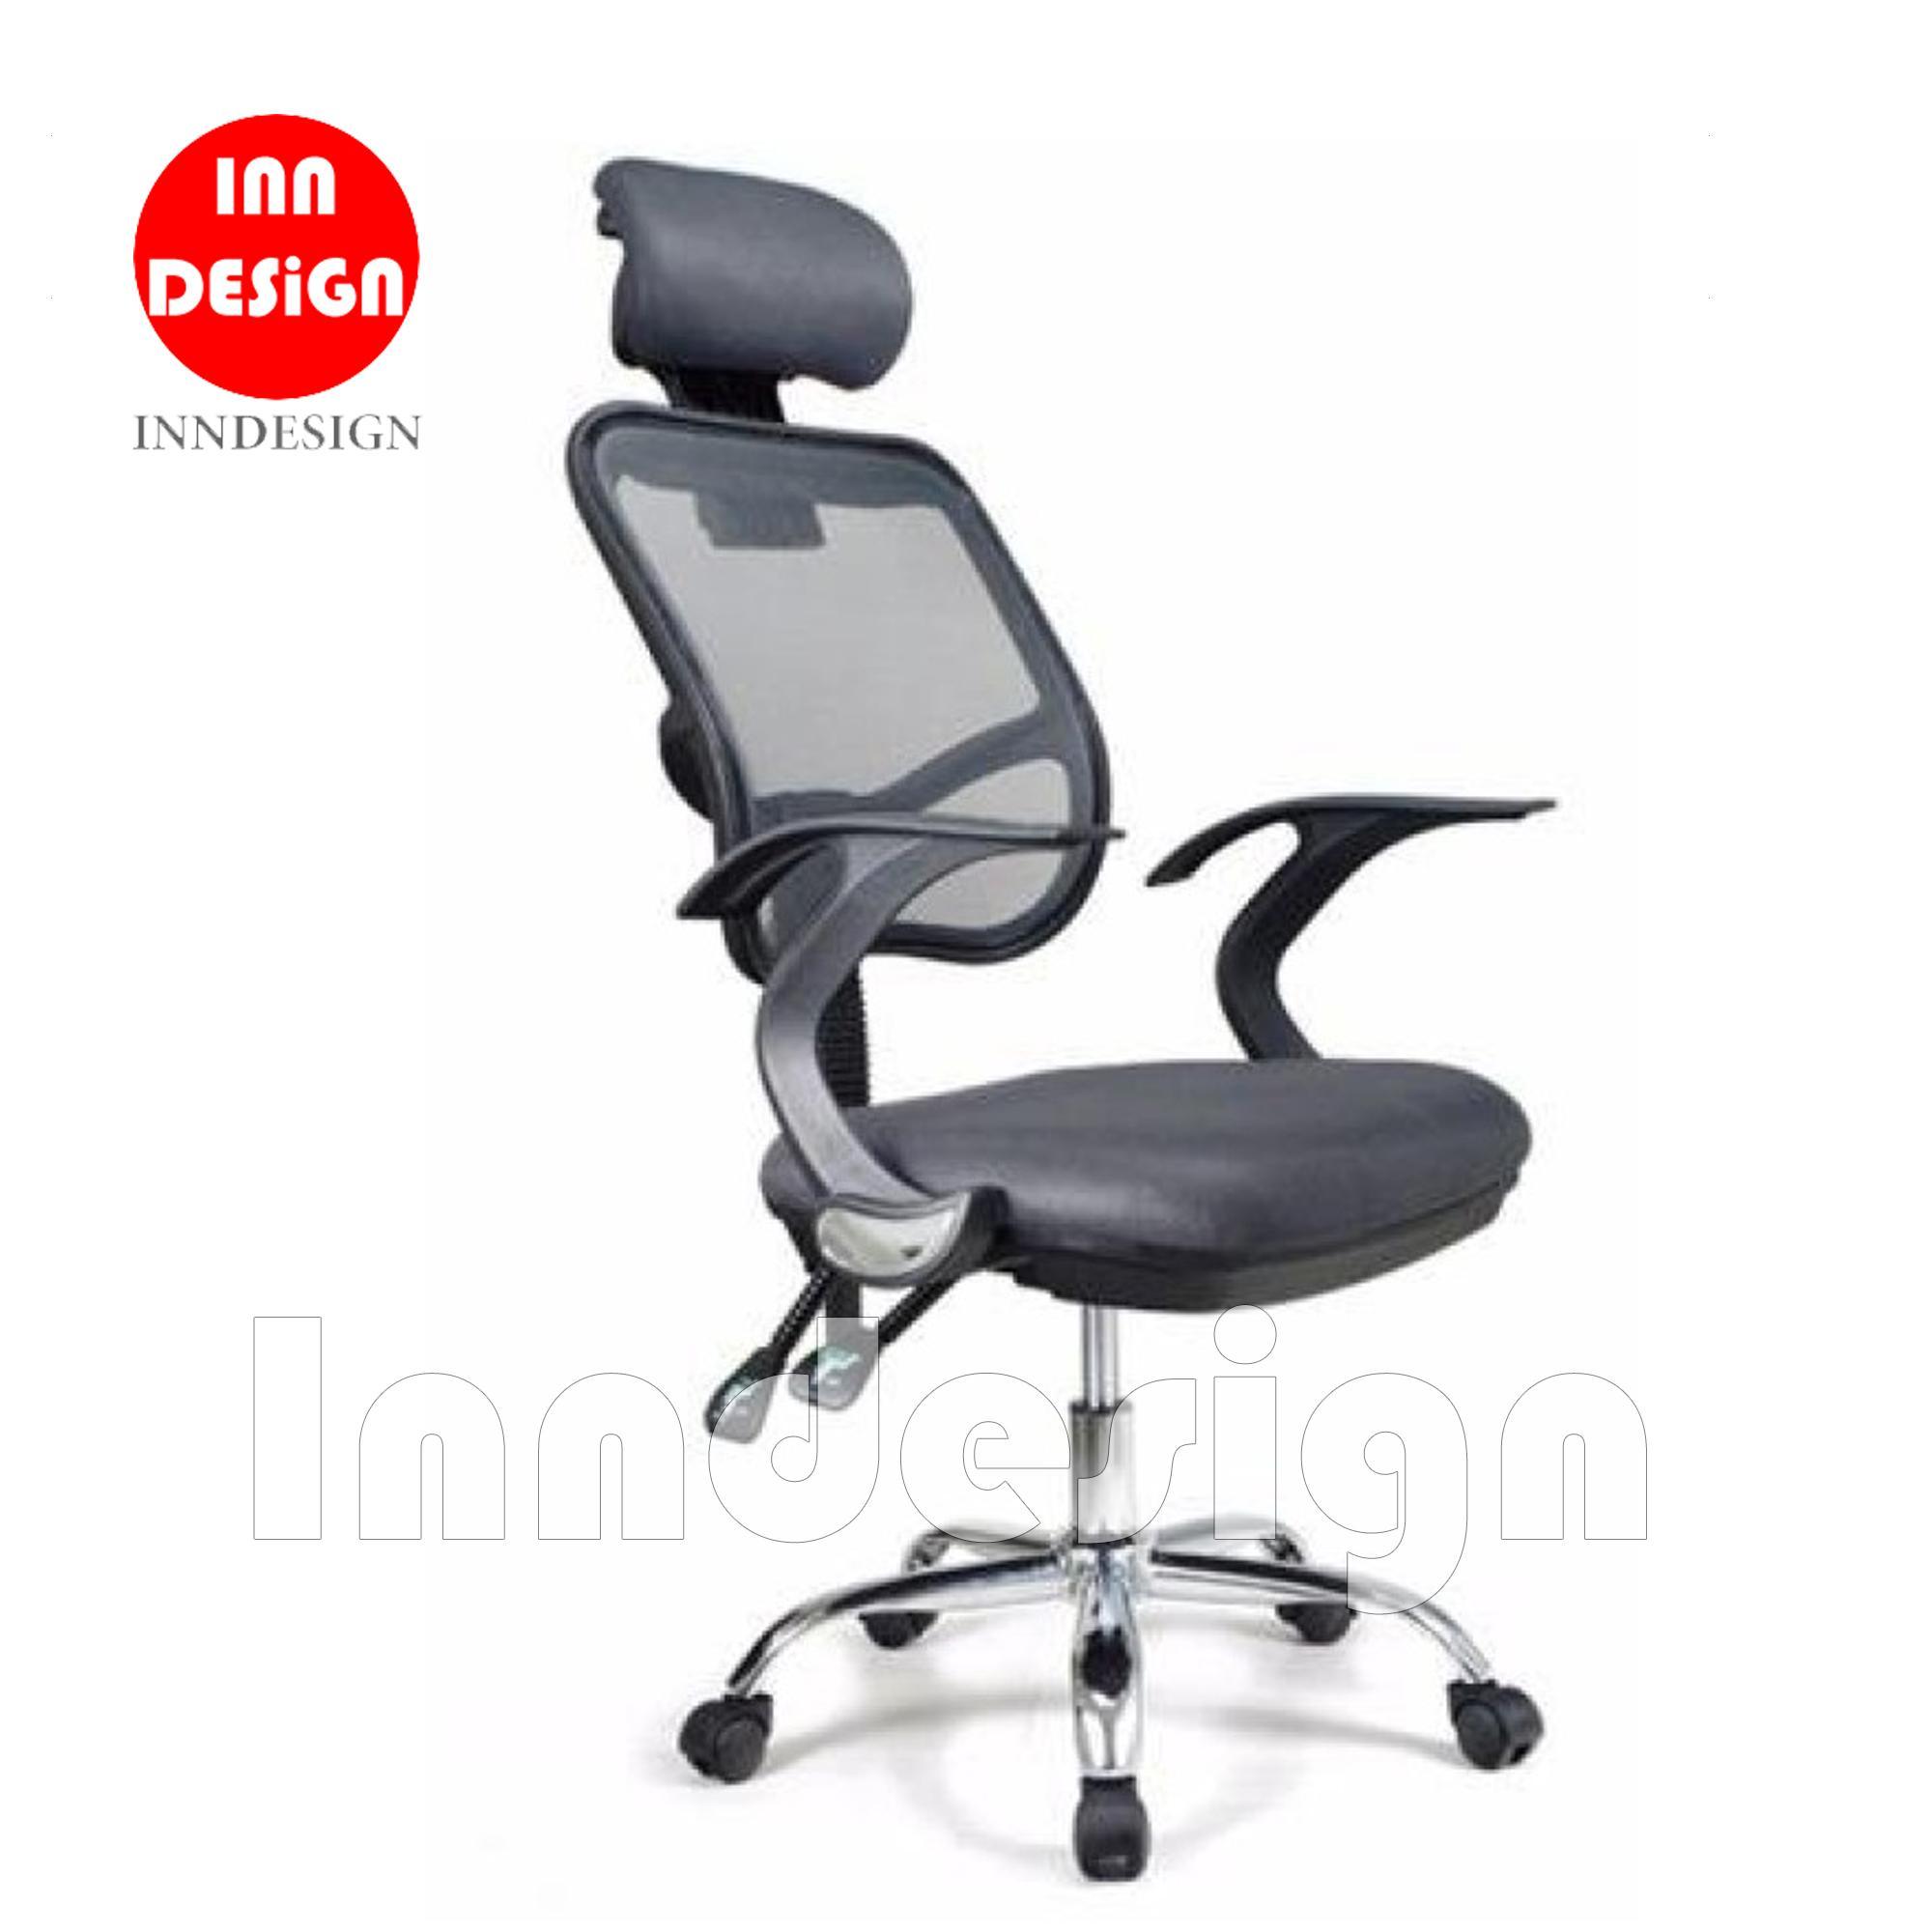 Dolando Adjustable Swivel Mesh Office Chair with PVC Chrome Leg / Study Chair / Chair (Black)